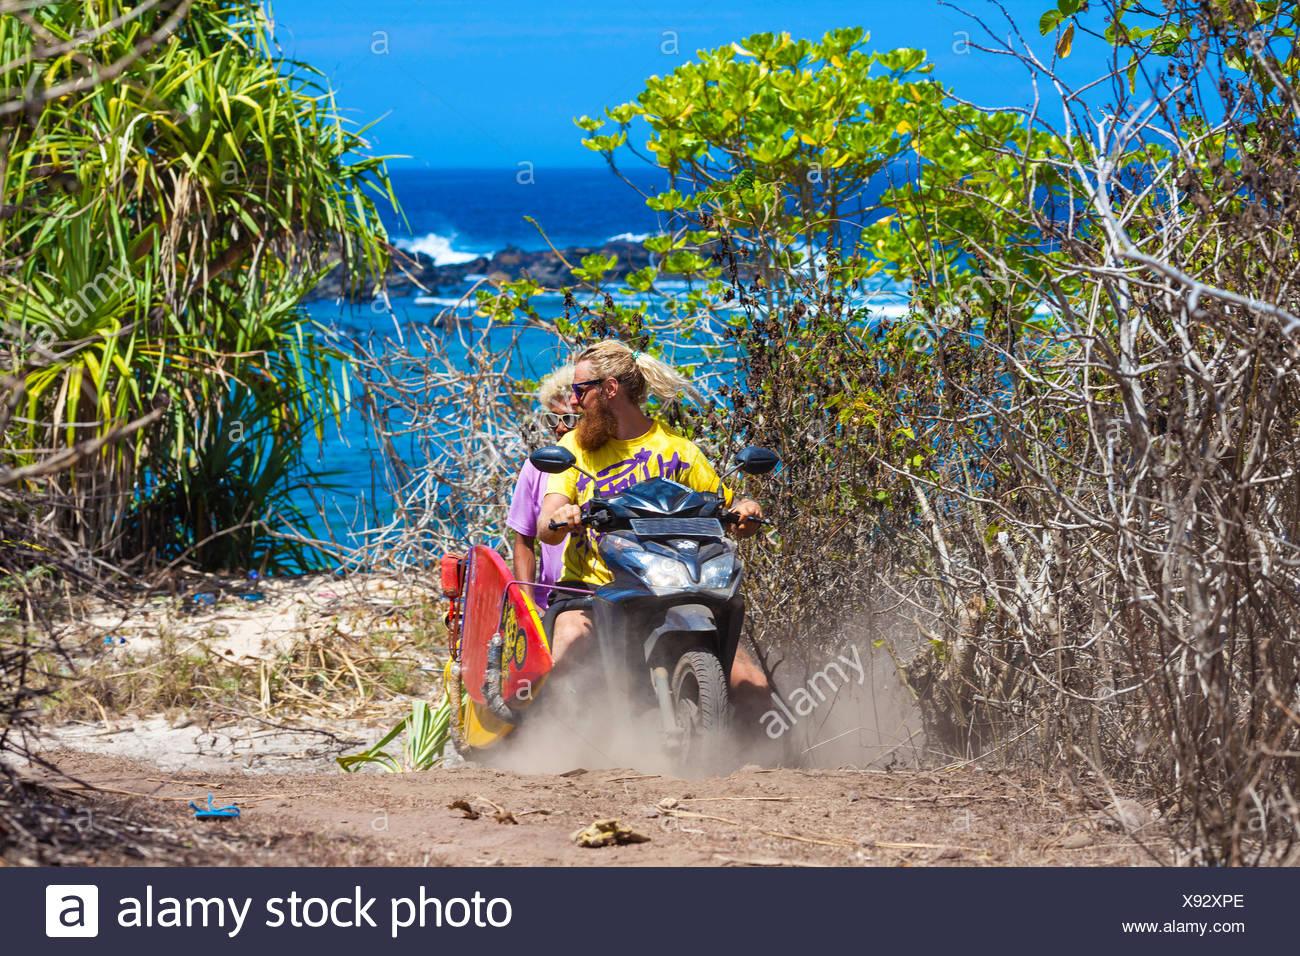 Deux internautes qui voyagent en vélo.Sumbawa island.L'Indonésie. Photo Stock